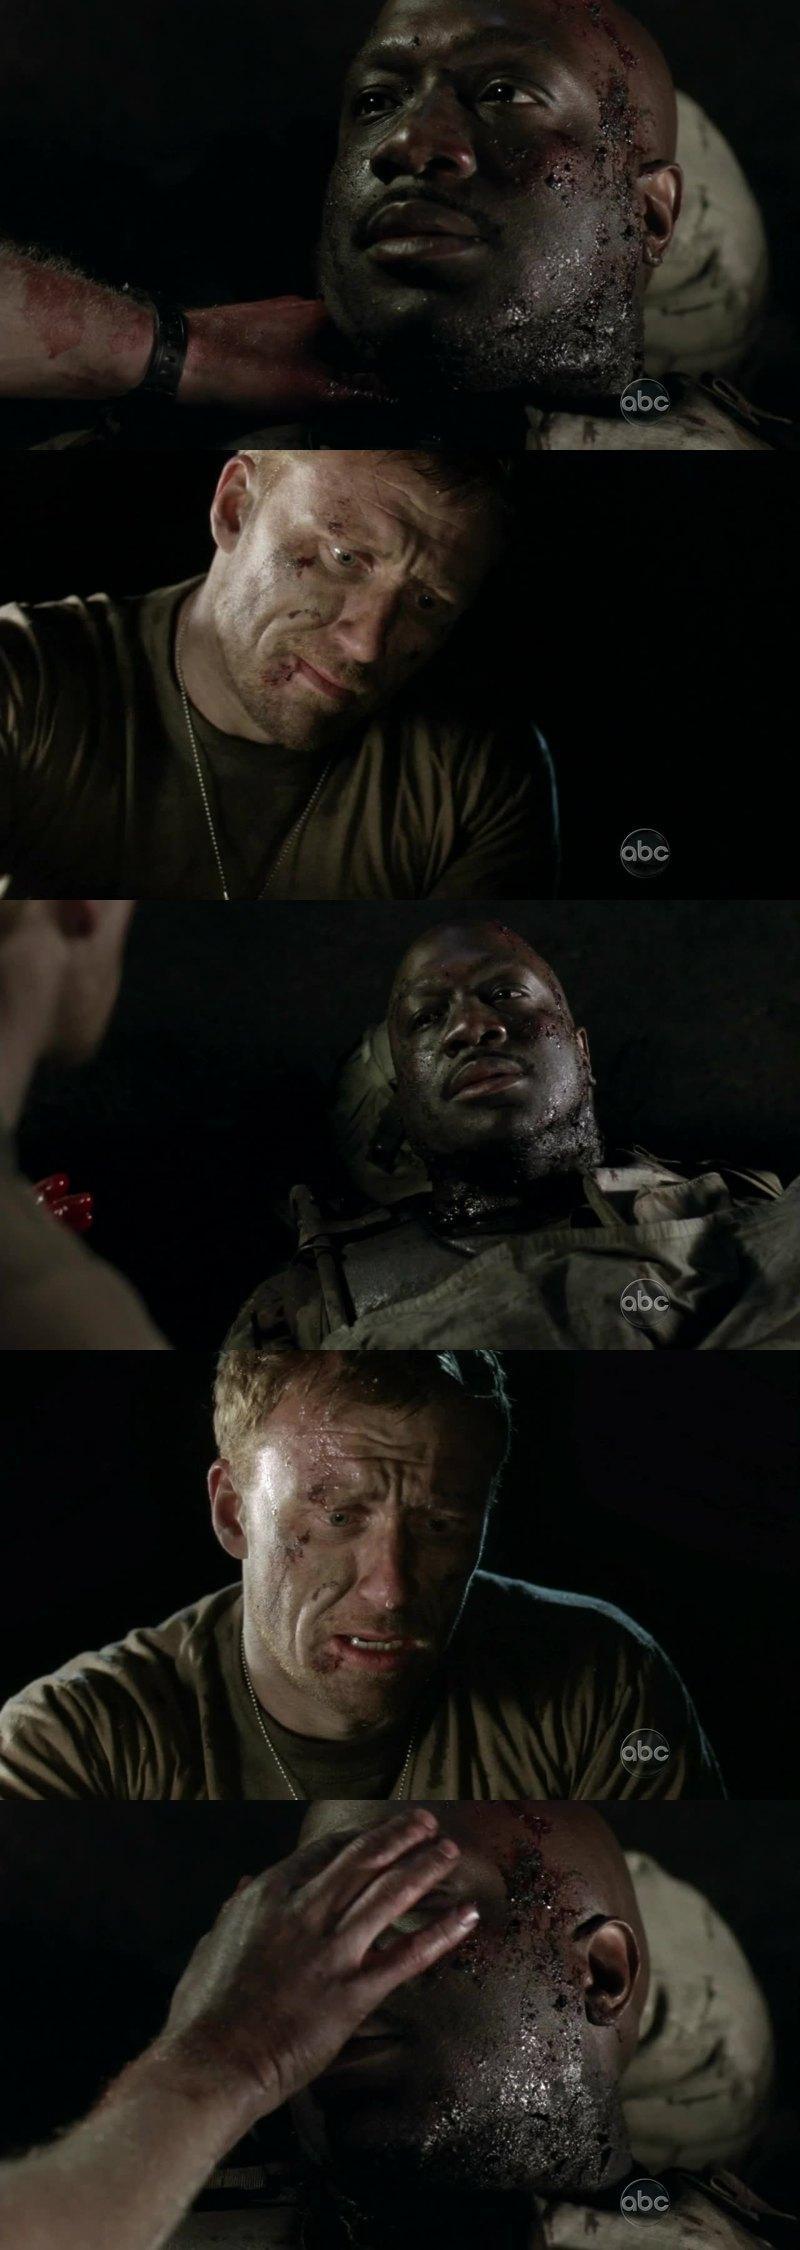 THIS SCENE WAS SO SAD!!